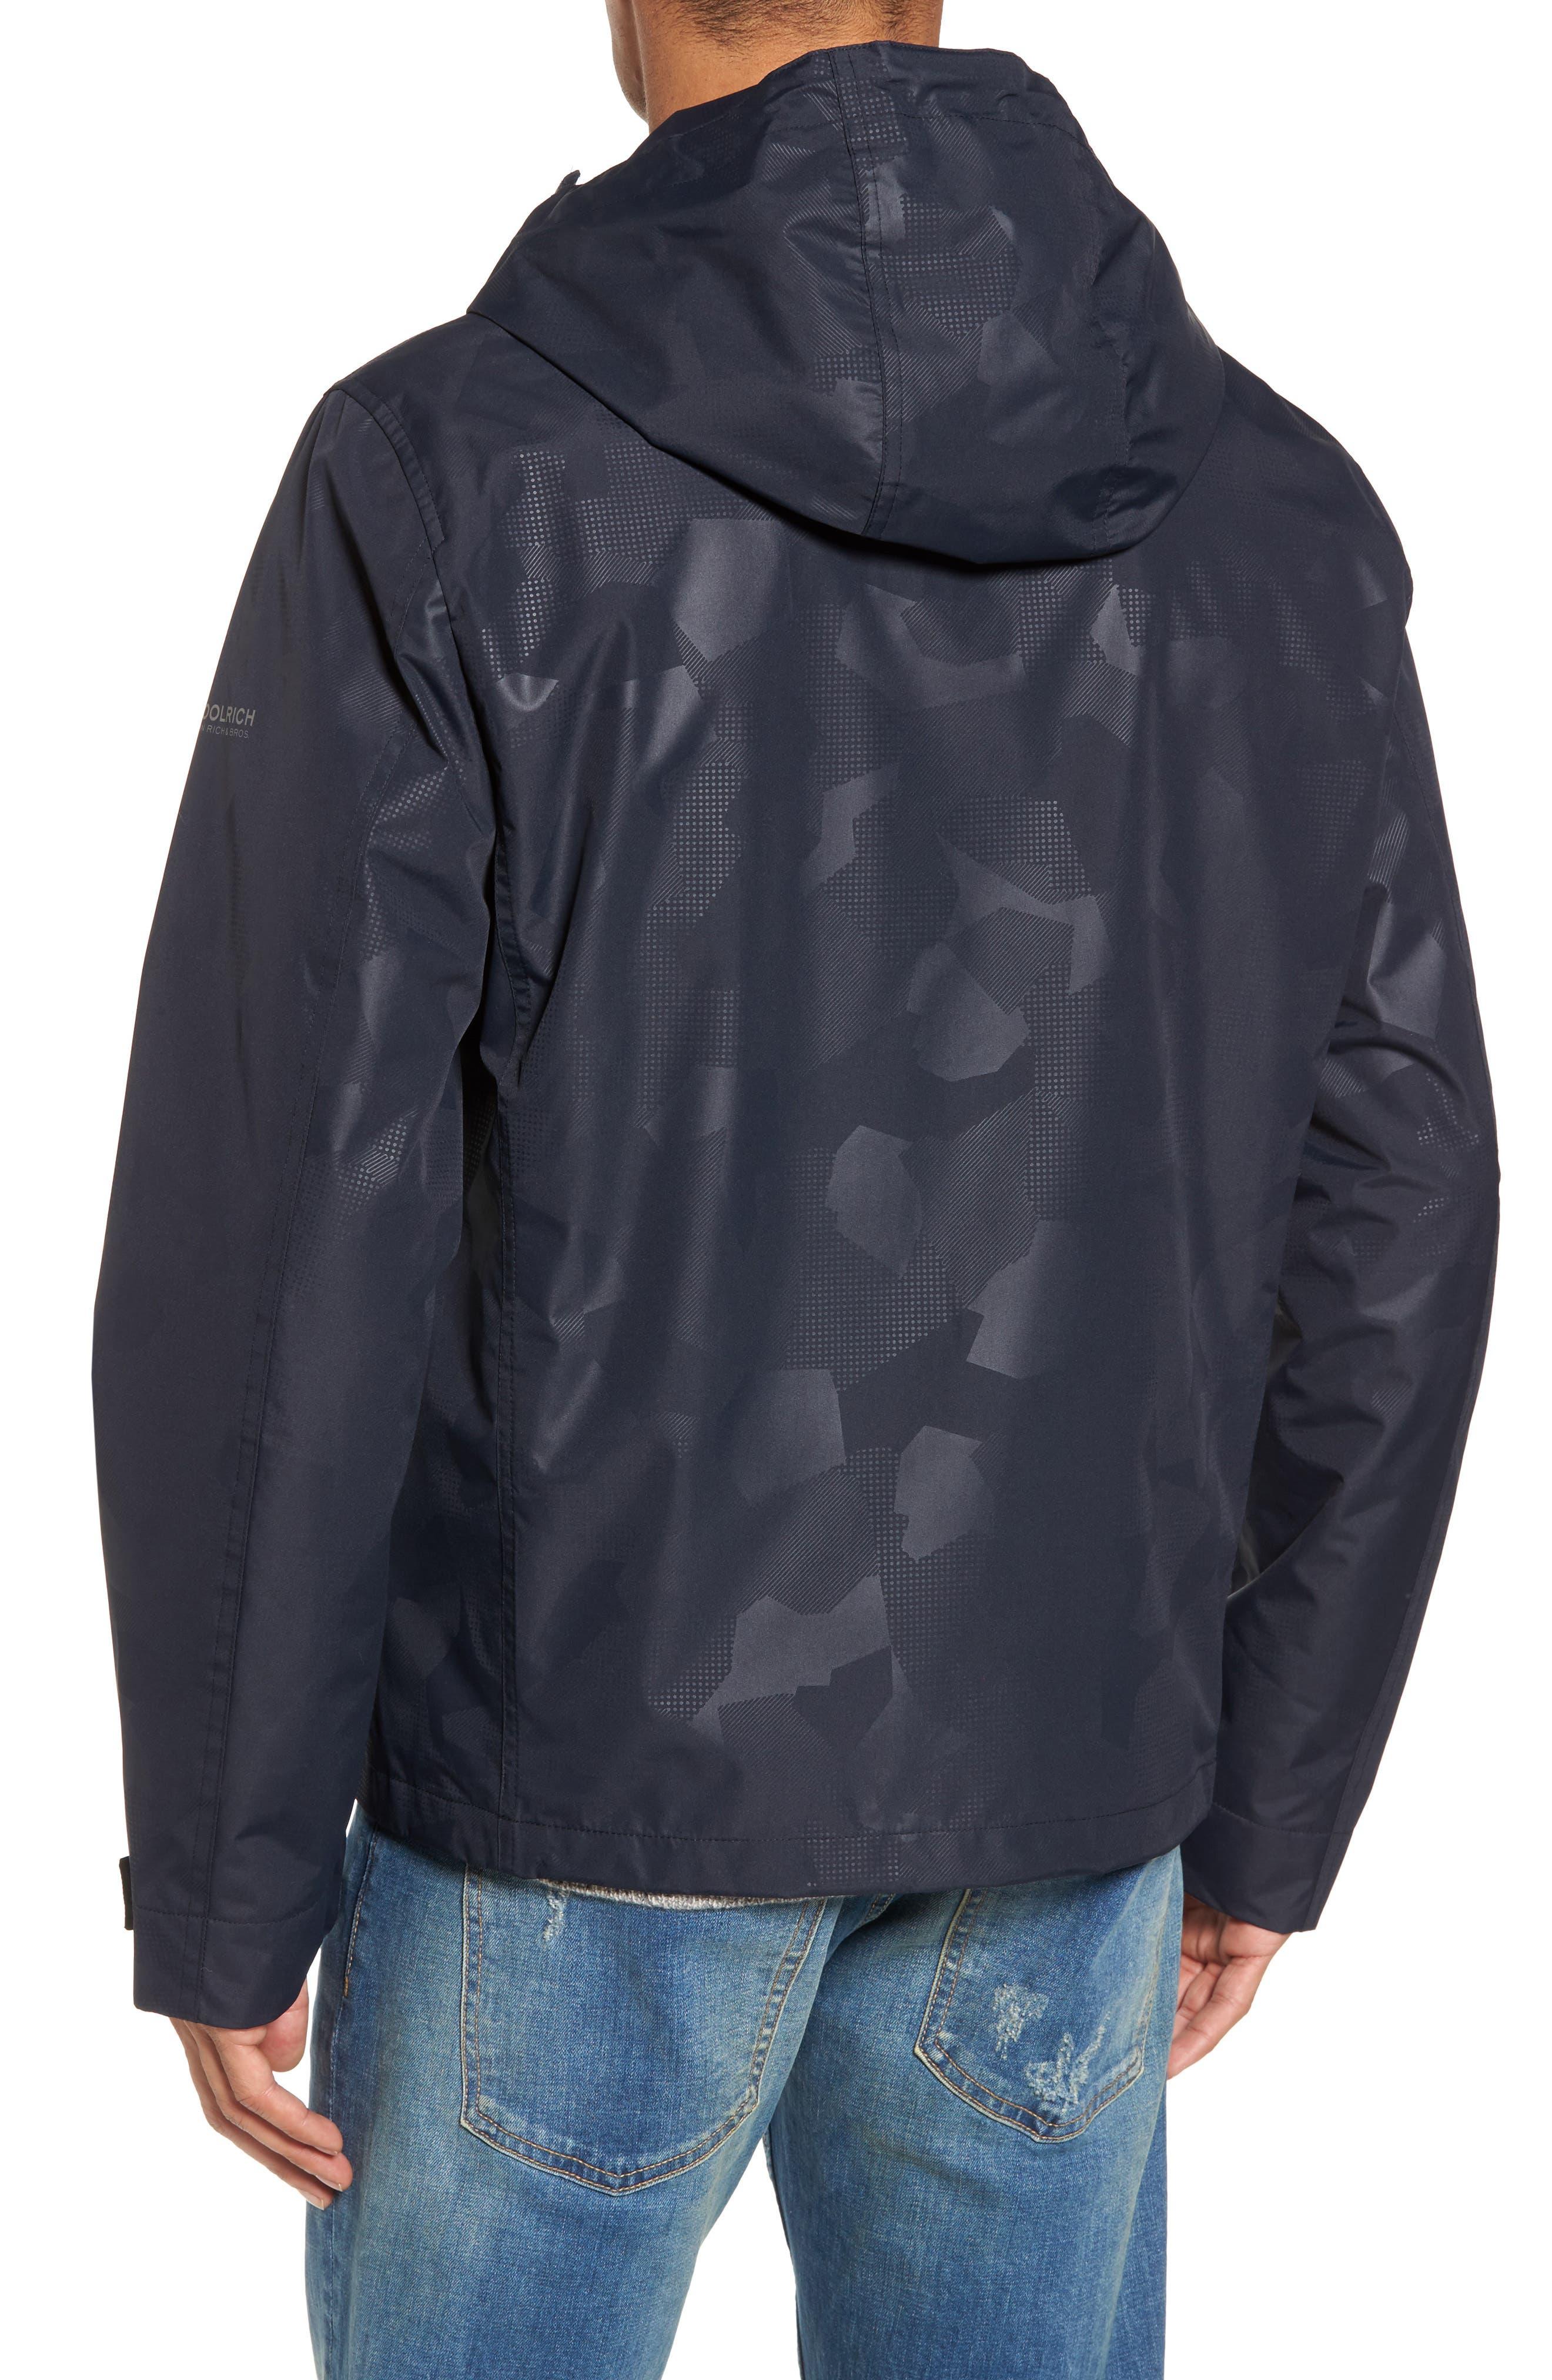 John Rich & Bros. Atlantic Camo Hooded Jacket,                             Alternate thumbnail 5, color,